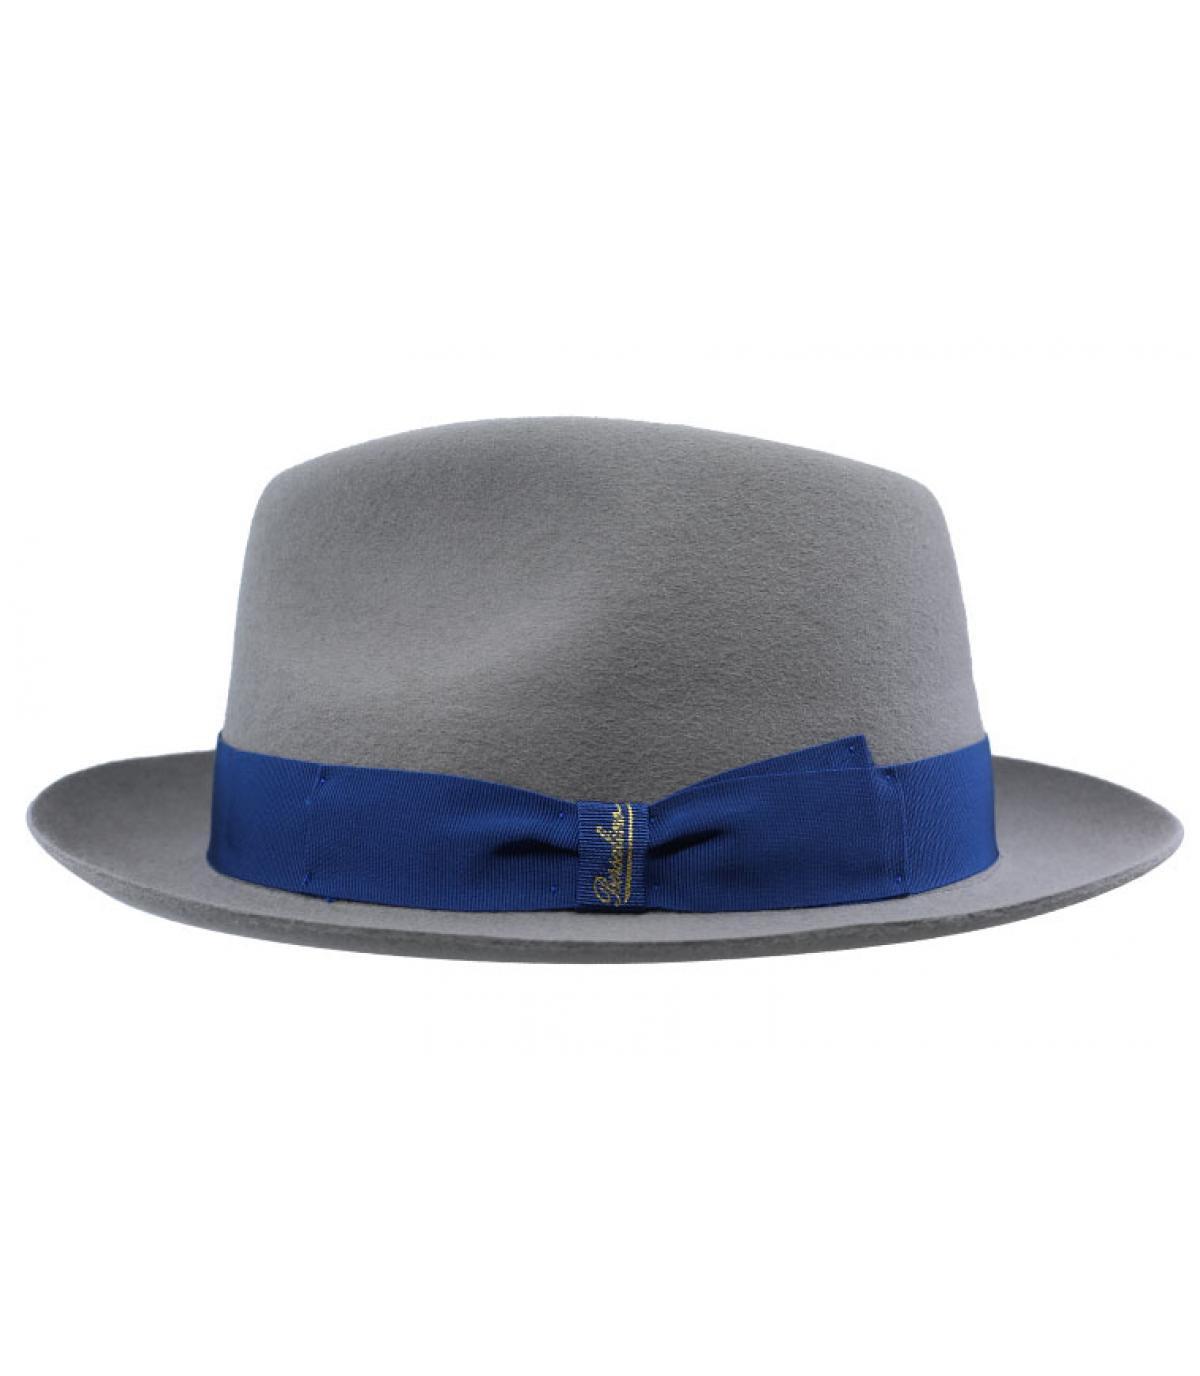 Detalles Grey Fur Felt Hat imagen 2